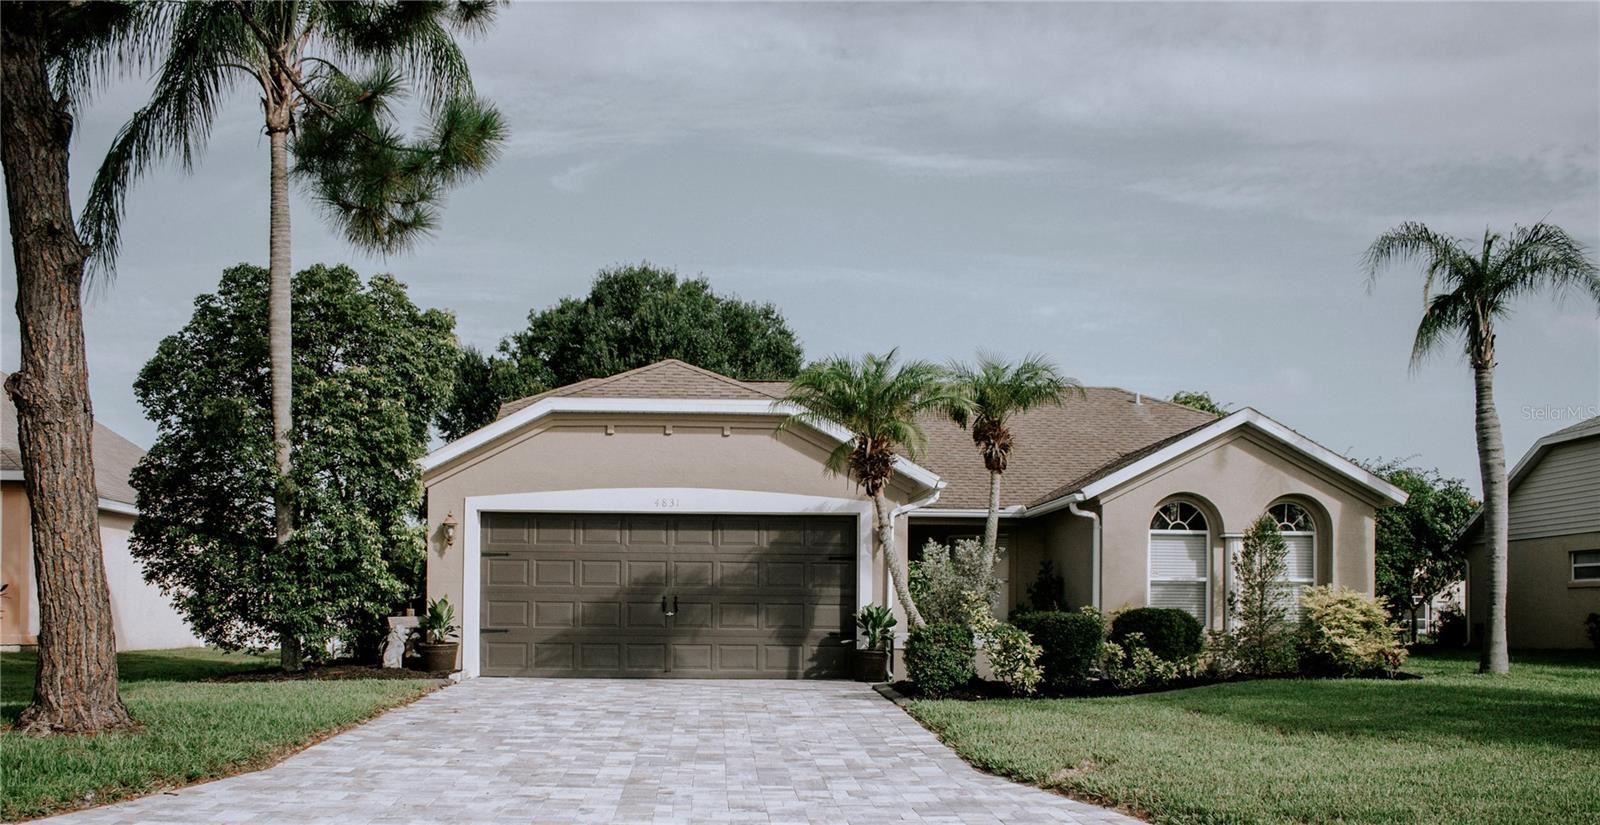 4831 11TH AVENUE CIRCLE E, Bradenton, FL 34208 - #: A4506884